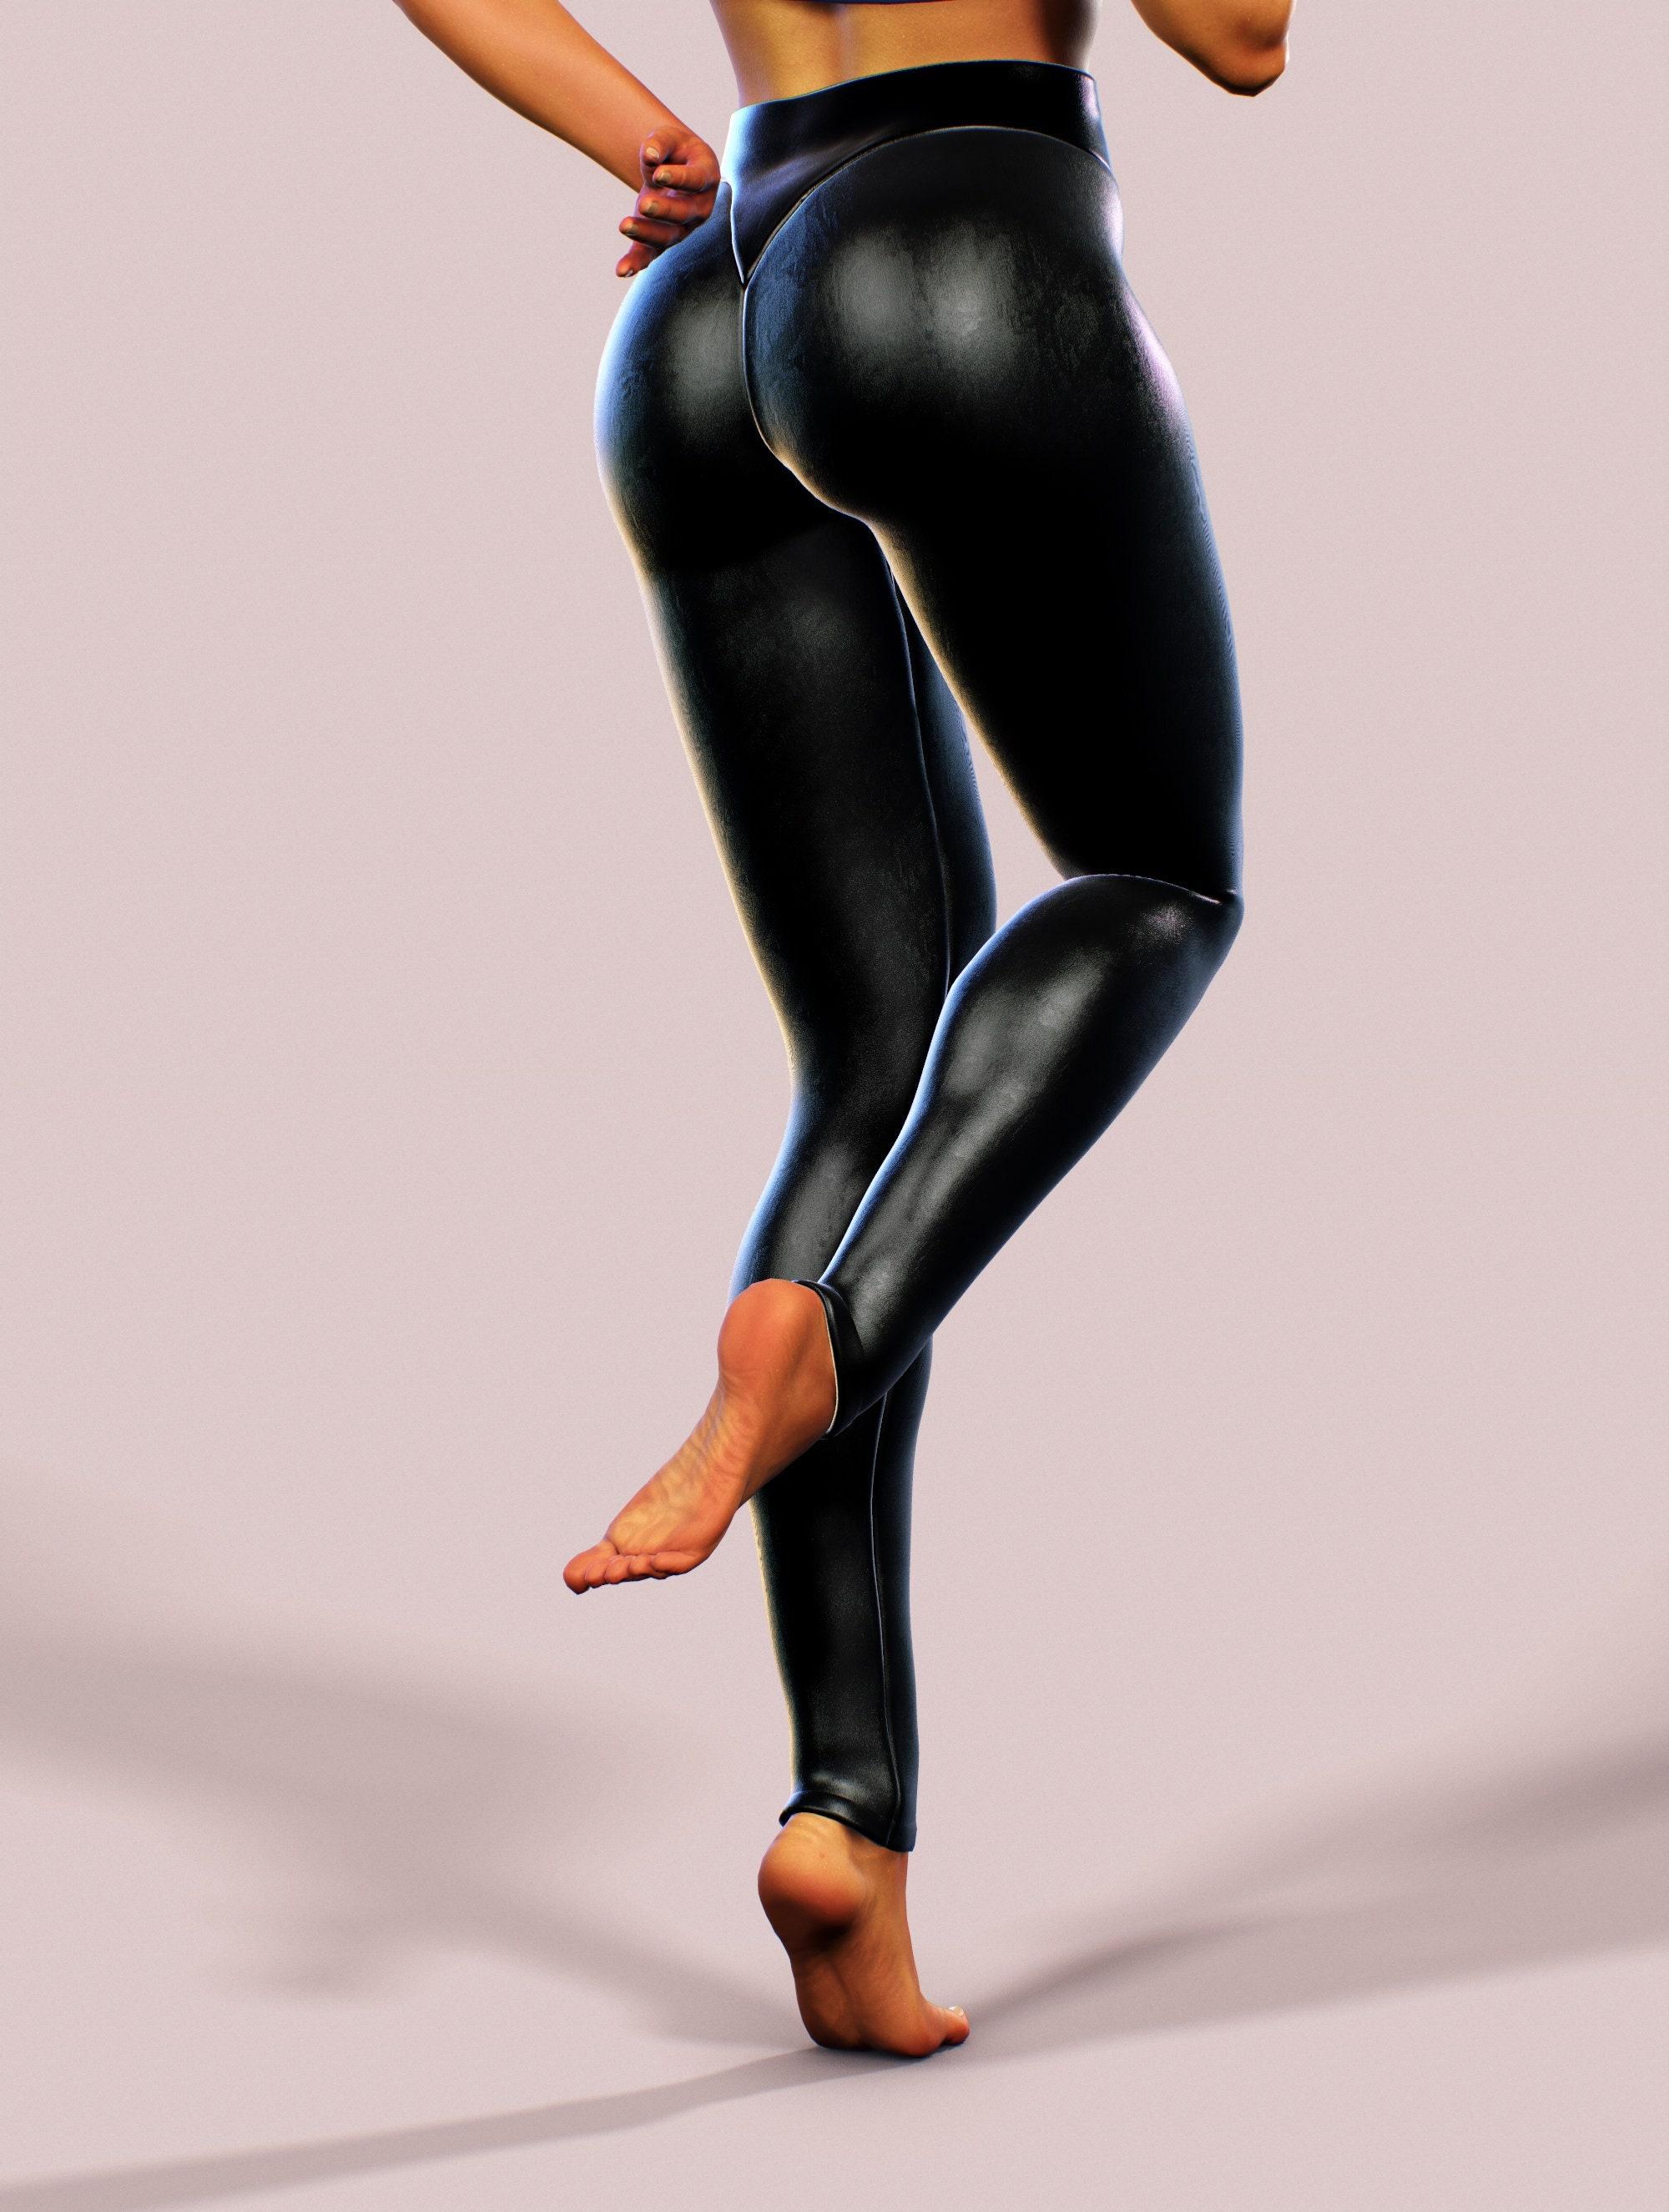 Leggings pics sexy Girls dressed